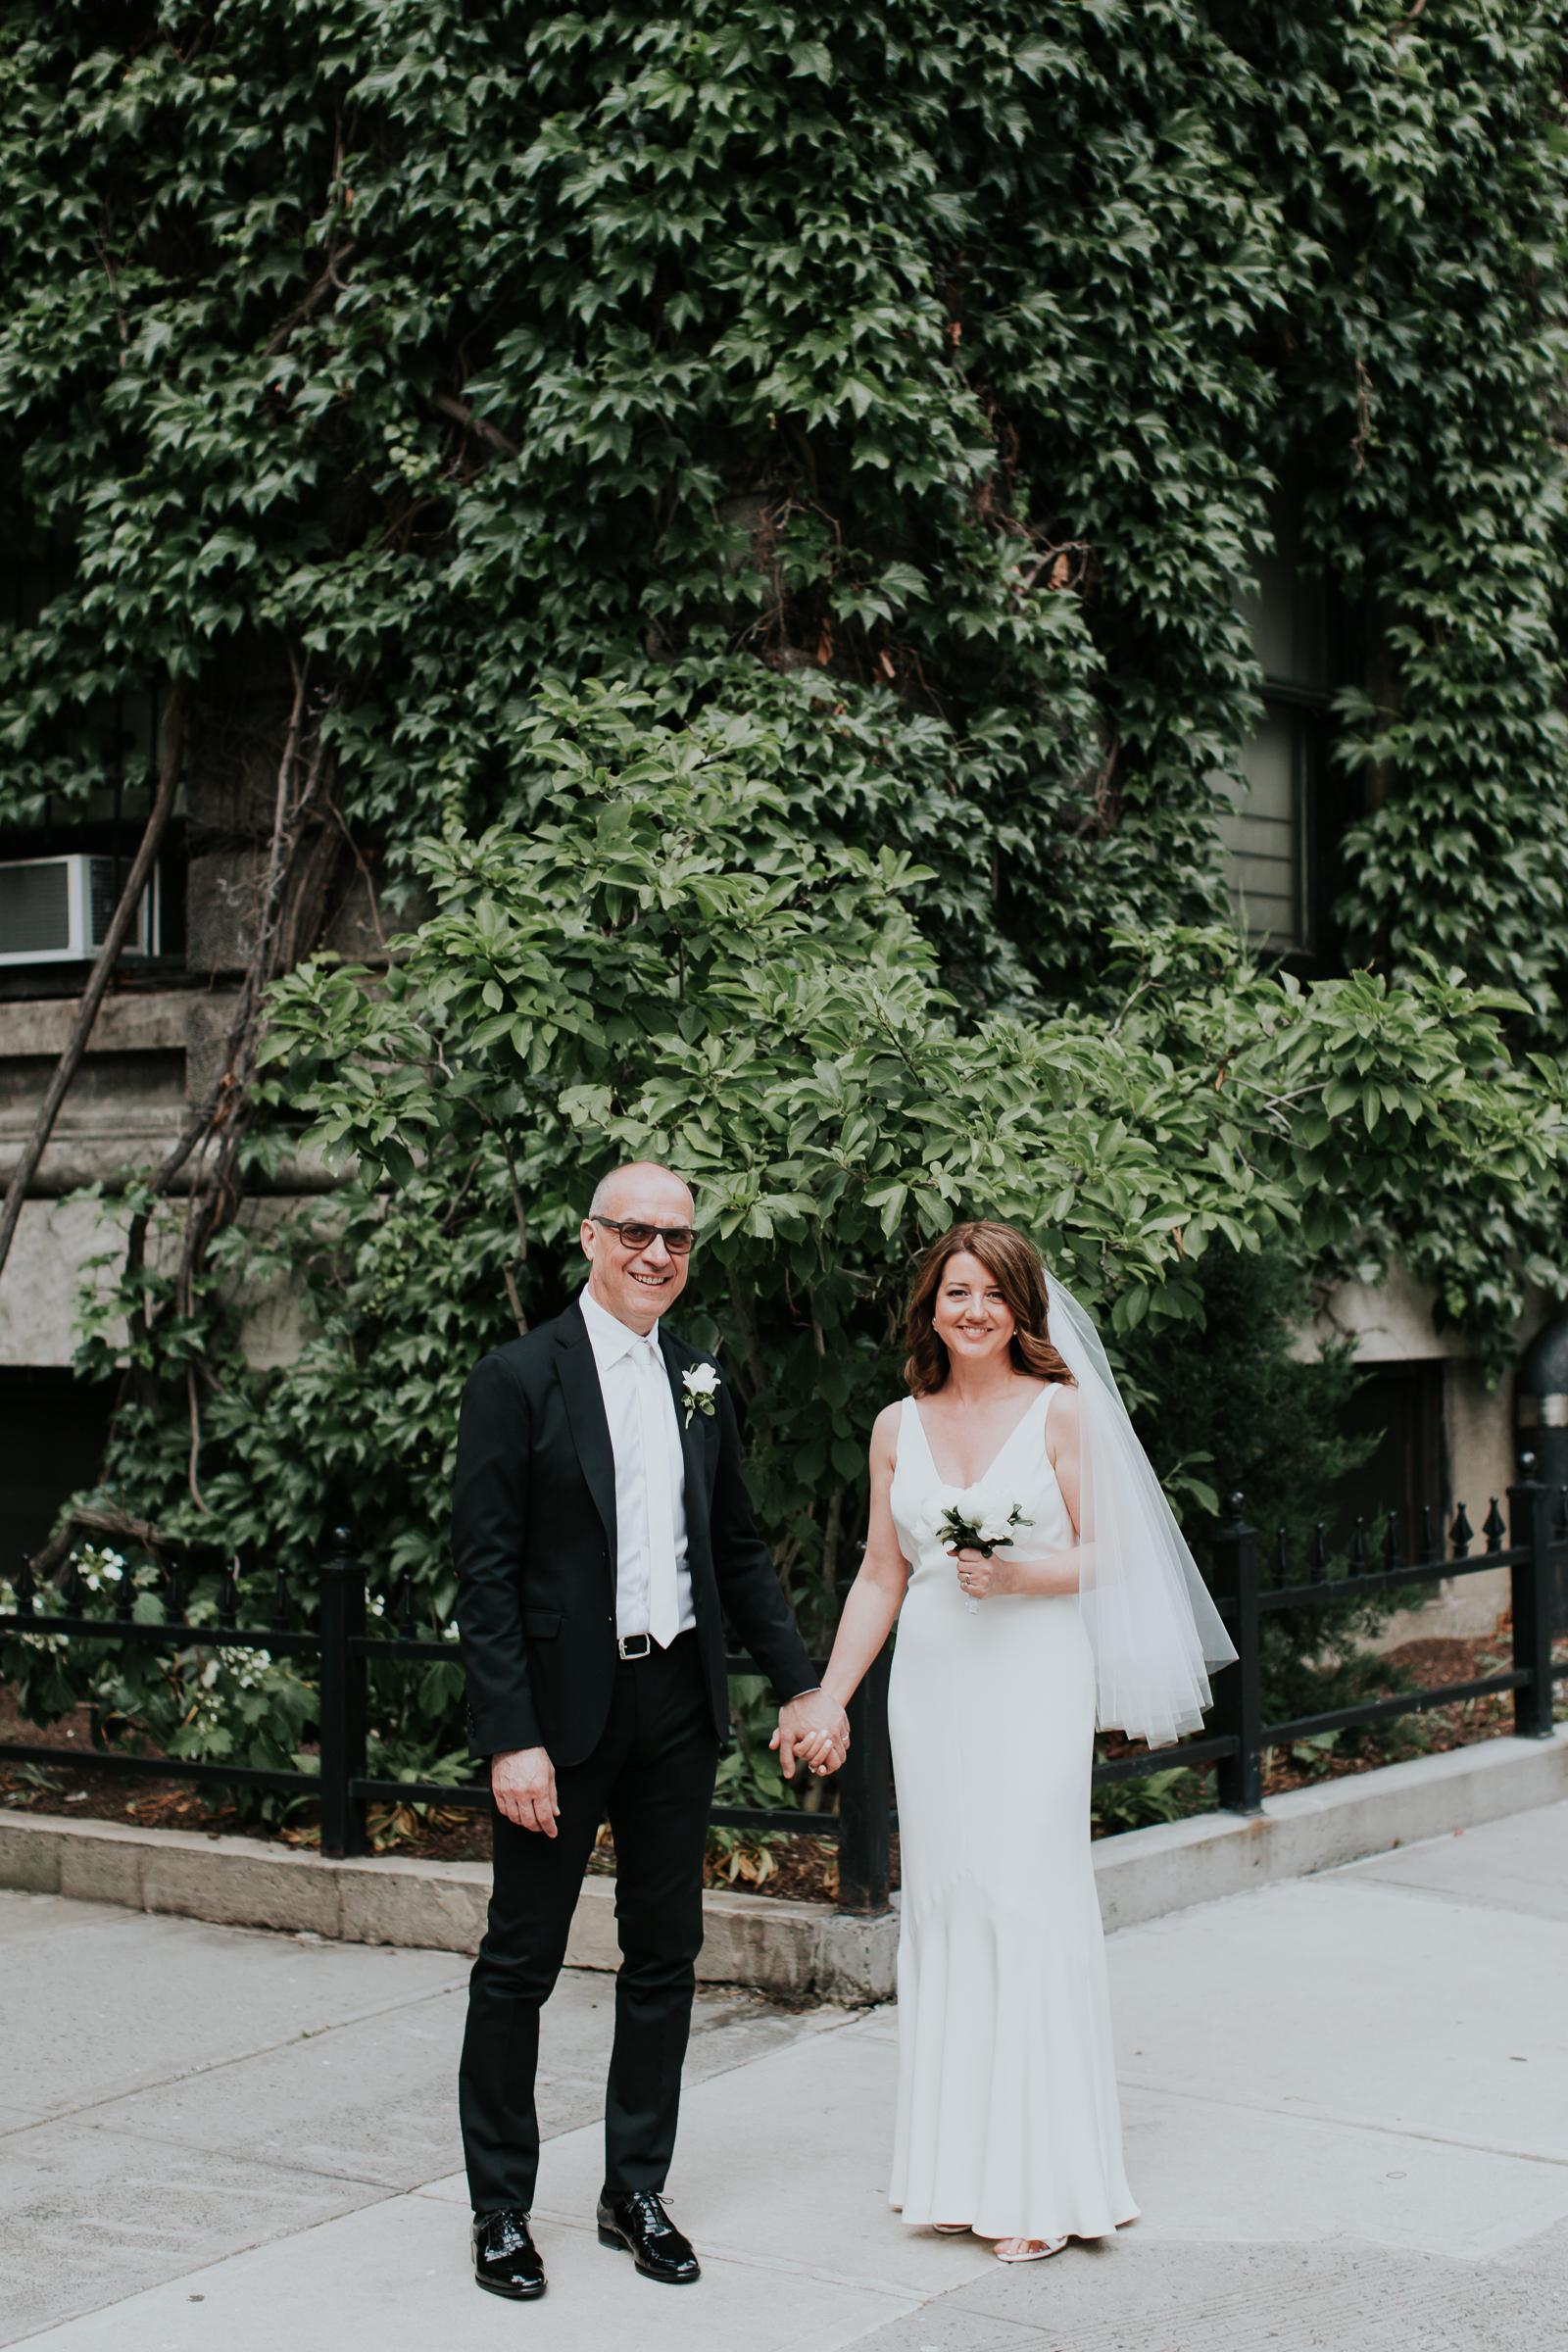 Robert-NYC-Museum-Of-Arts-&-Design-Greek-Italian-New-York-Documentary-Wedding-Photographer-32.jpg